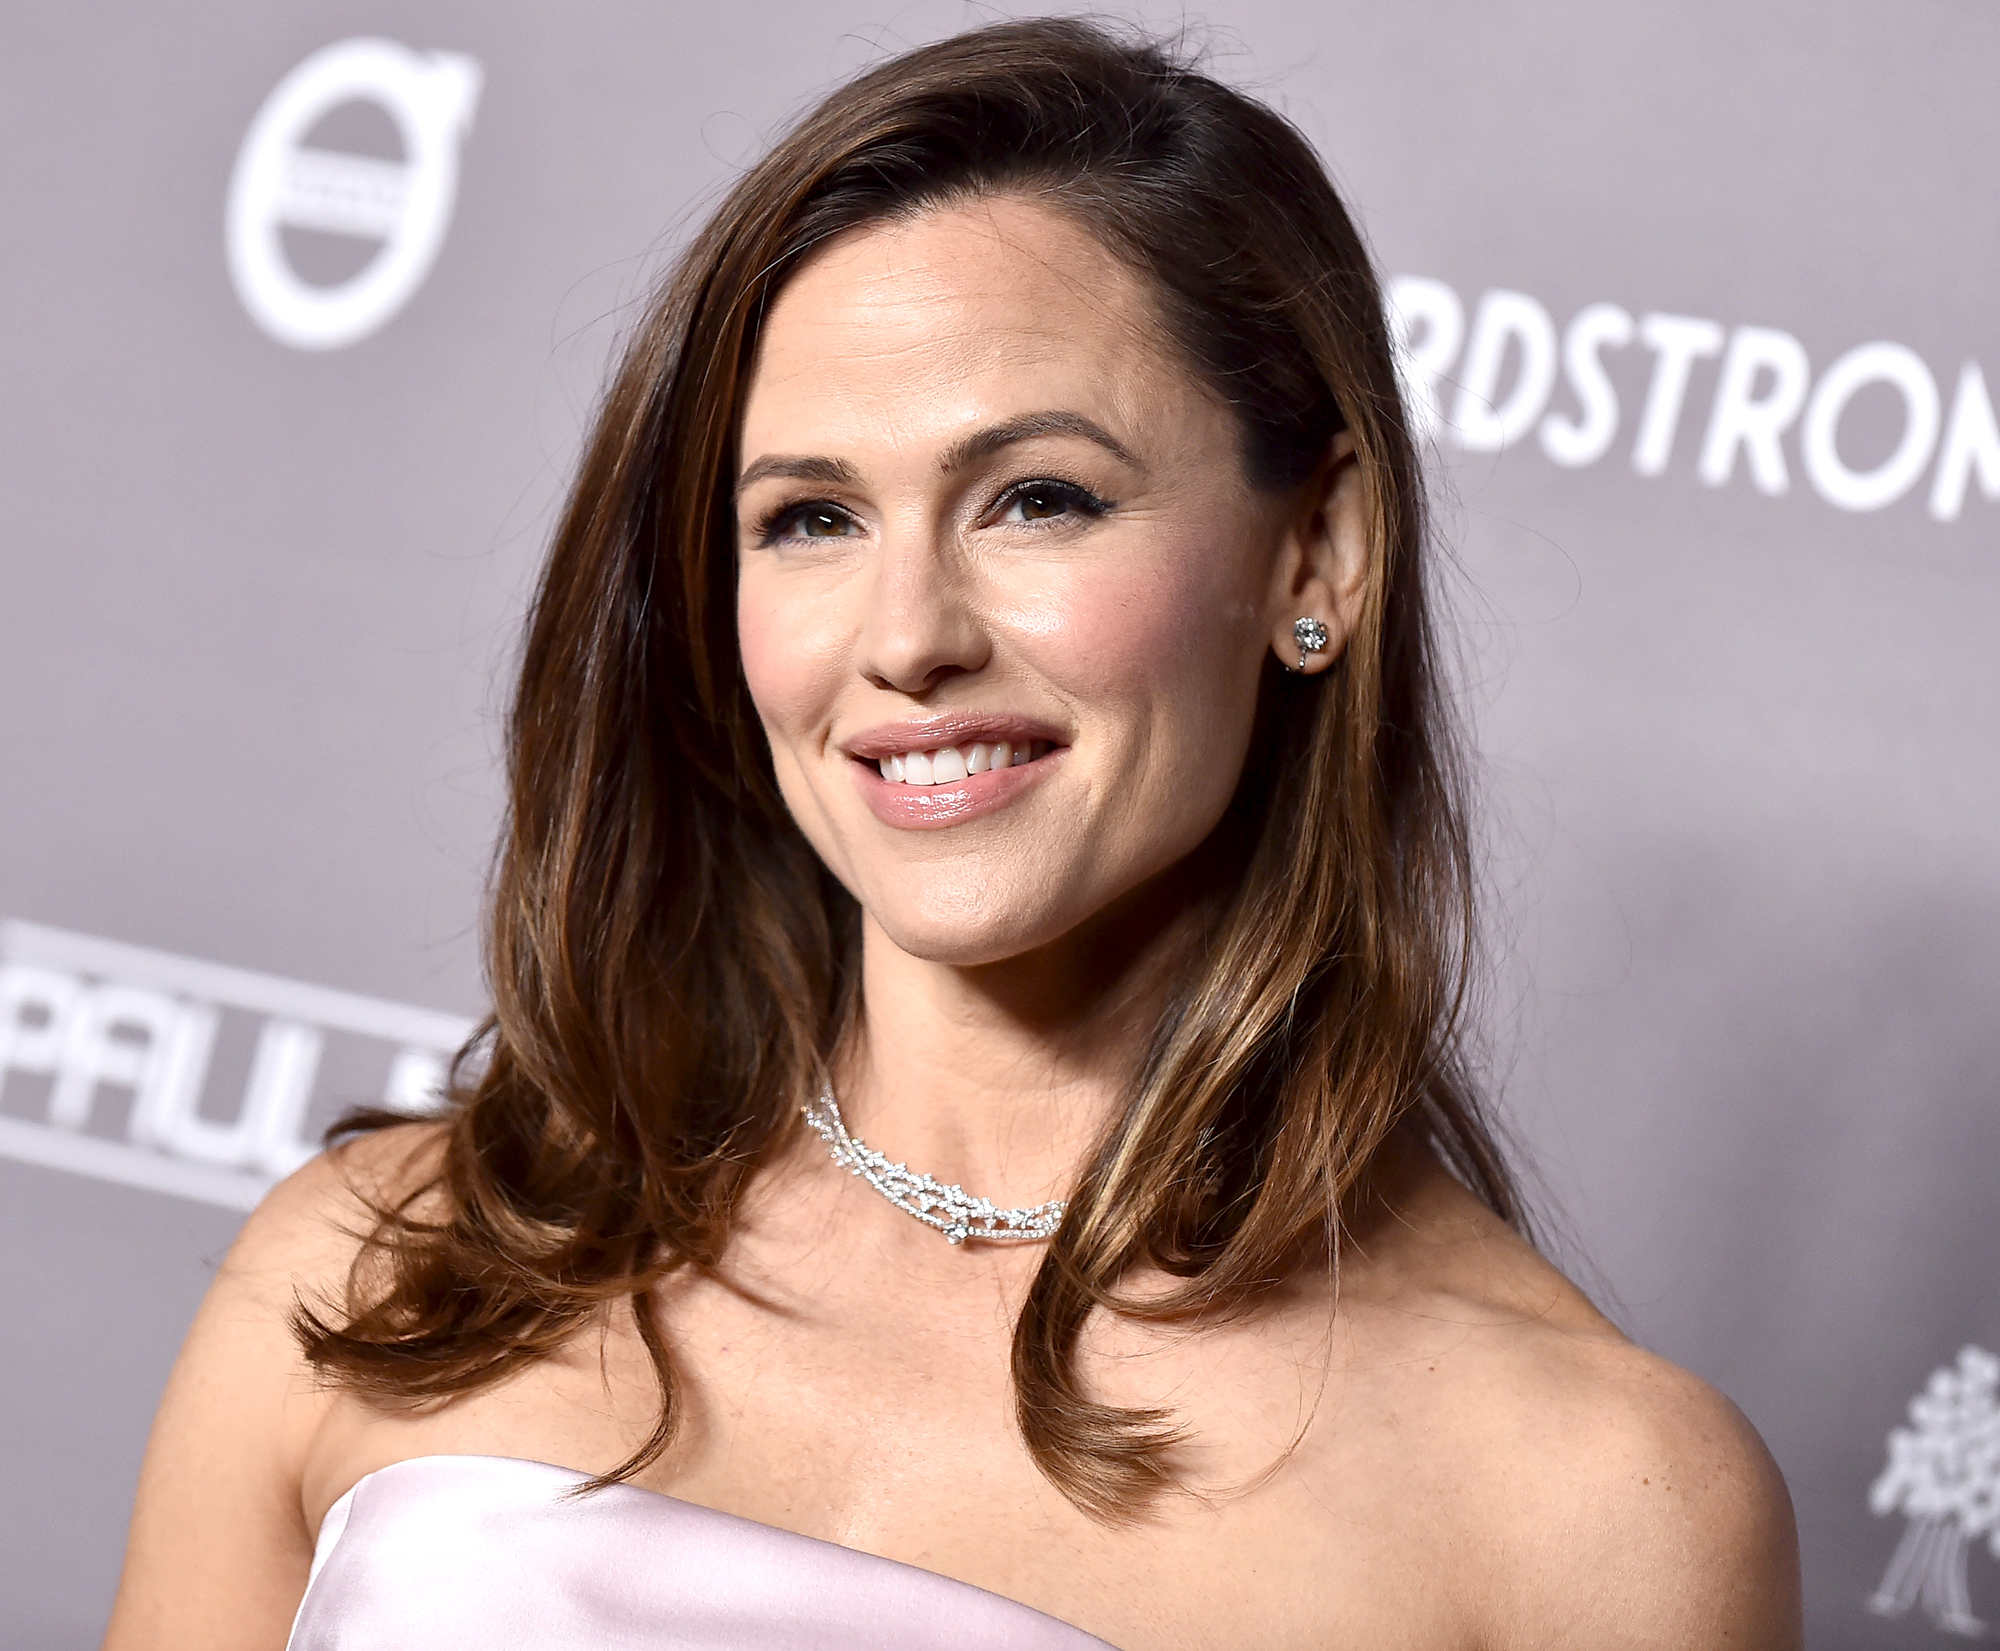 Jennifer Garner Shares Expert Breakup Advice With Instagram Fan